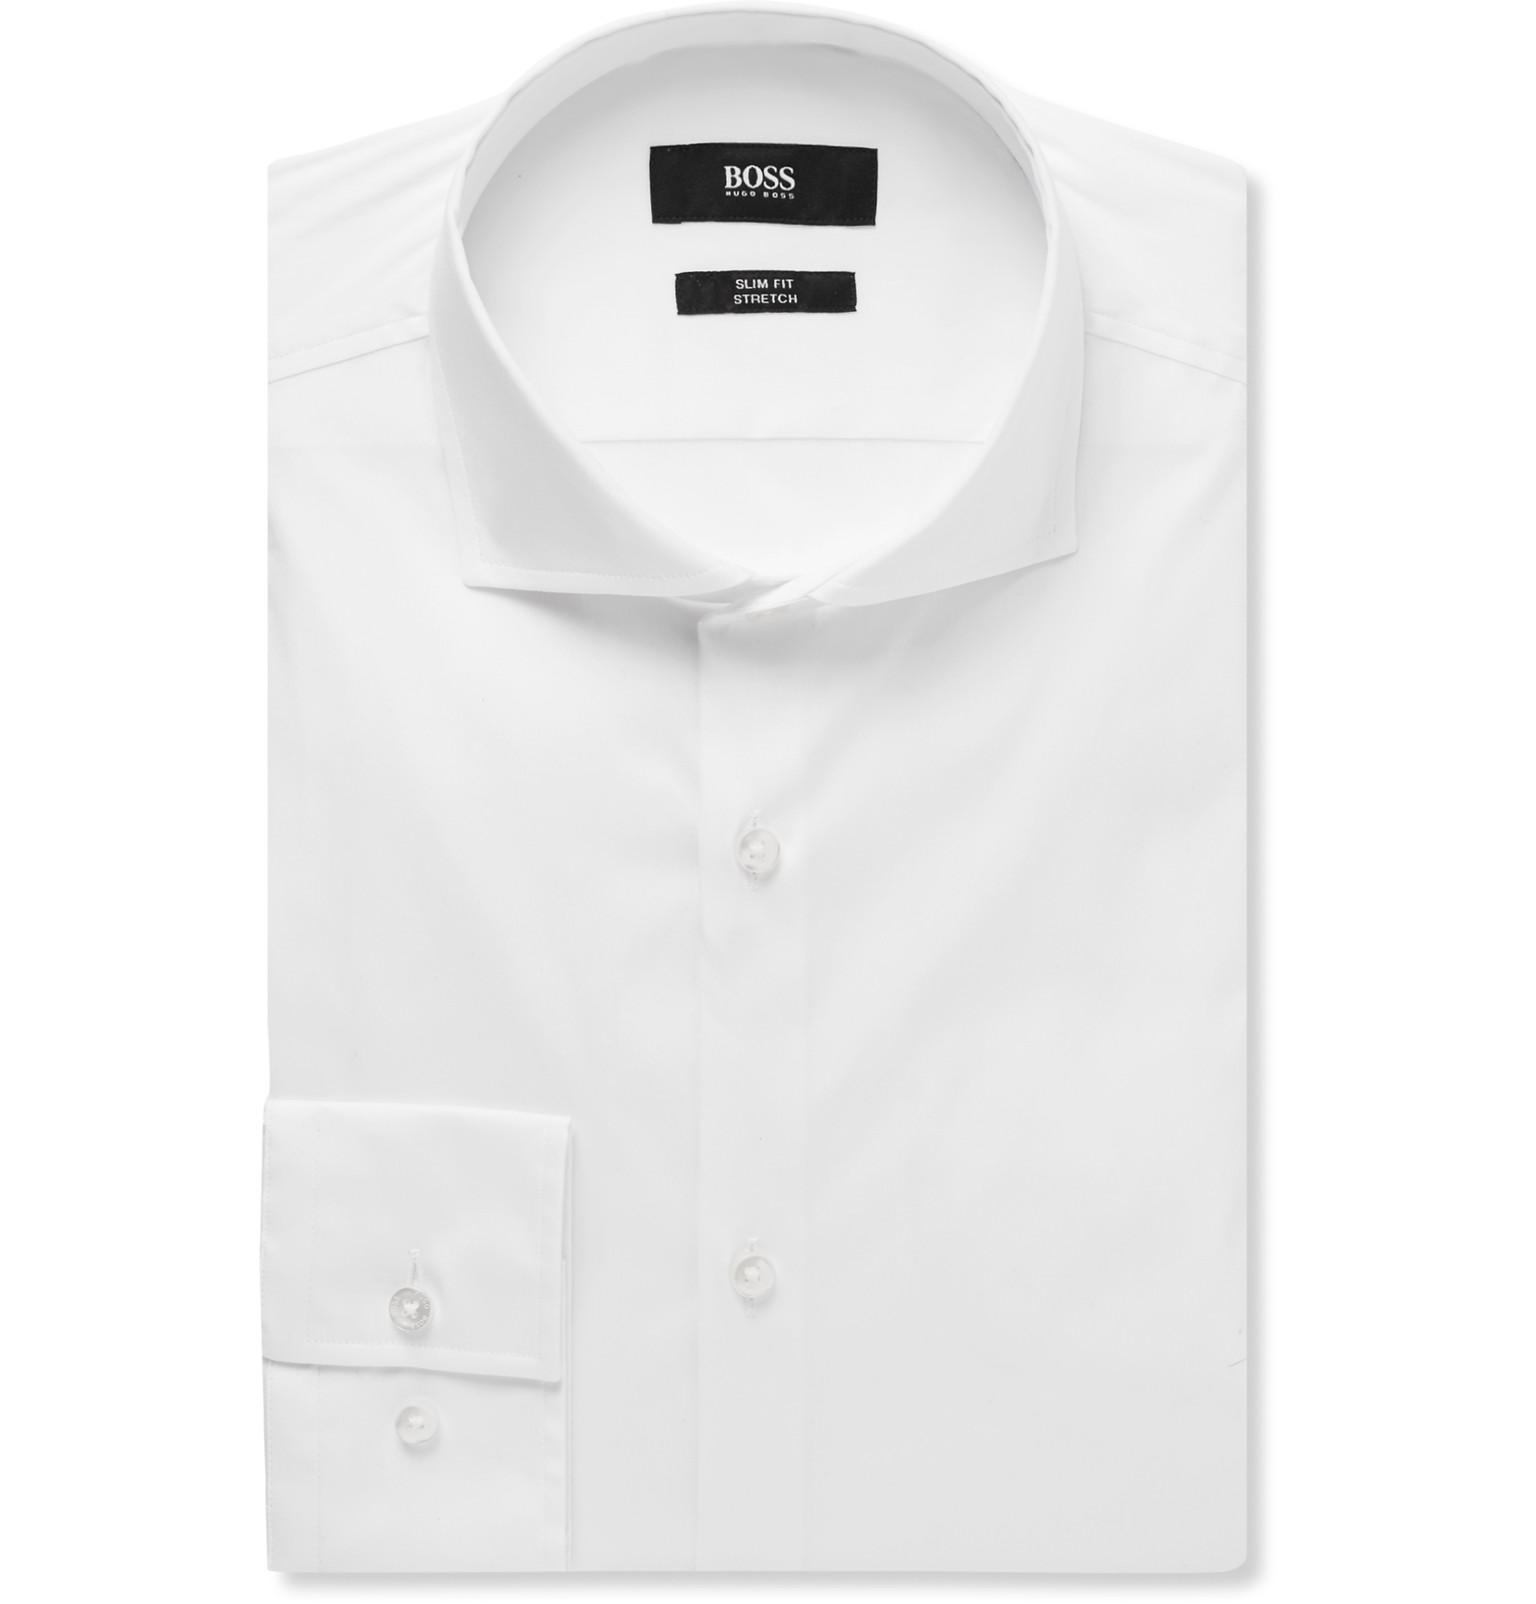 6c058c817 Hugo Boss Slim Fit Dress Shirt White - DREAMWORKS